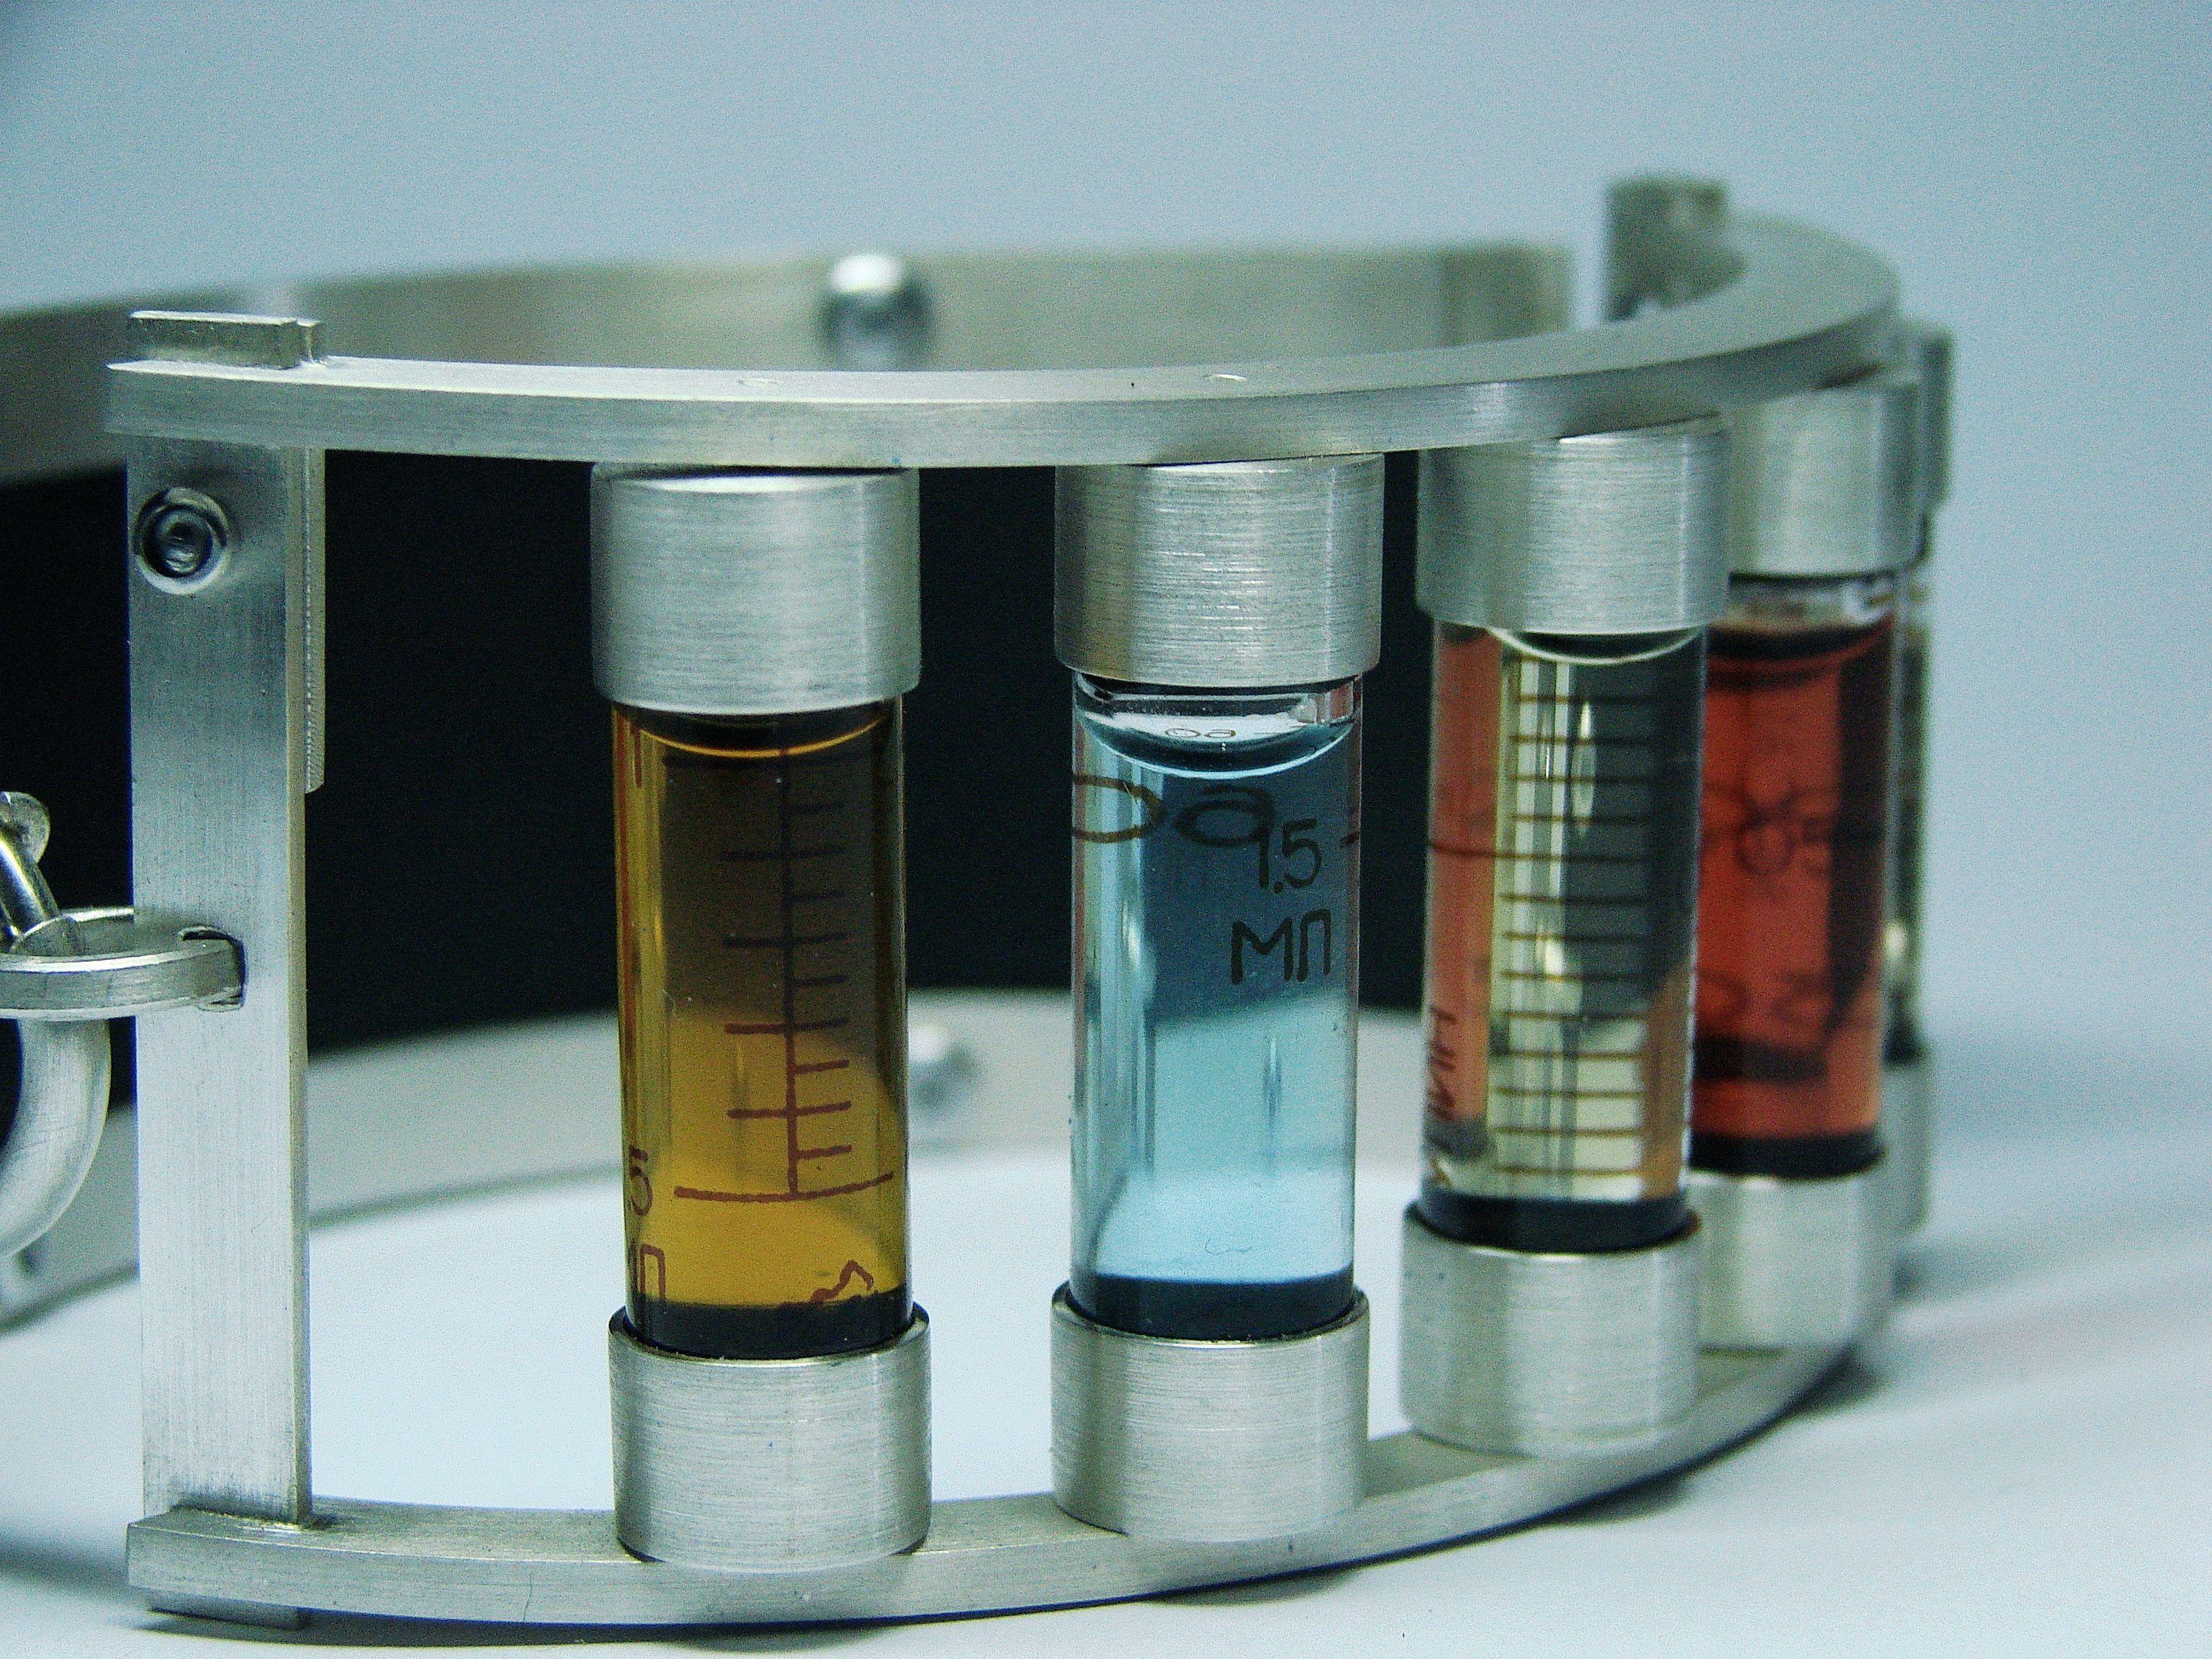 'Automotive' Bracelet Made of Car Parts & Gasoline